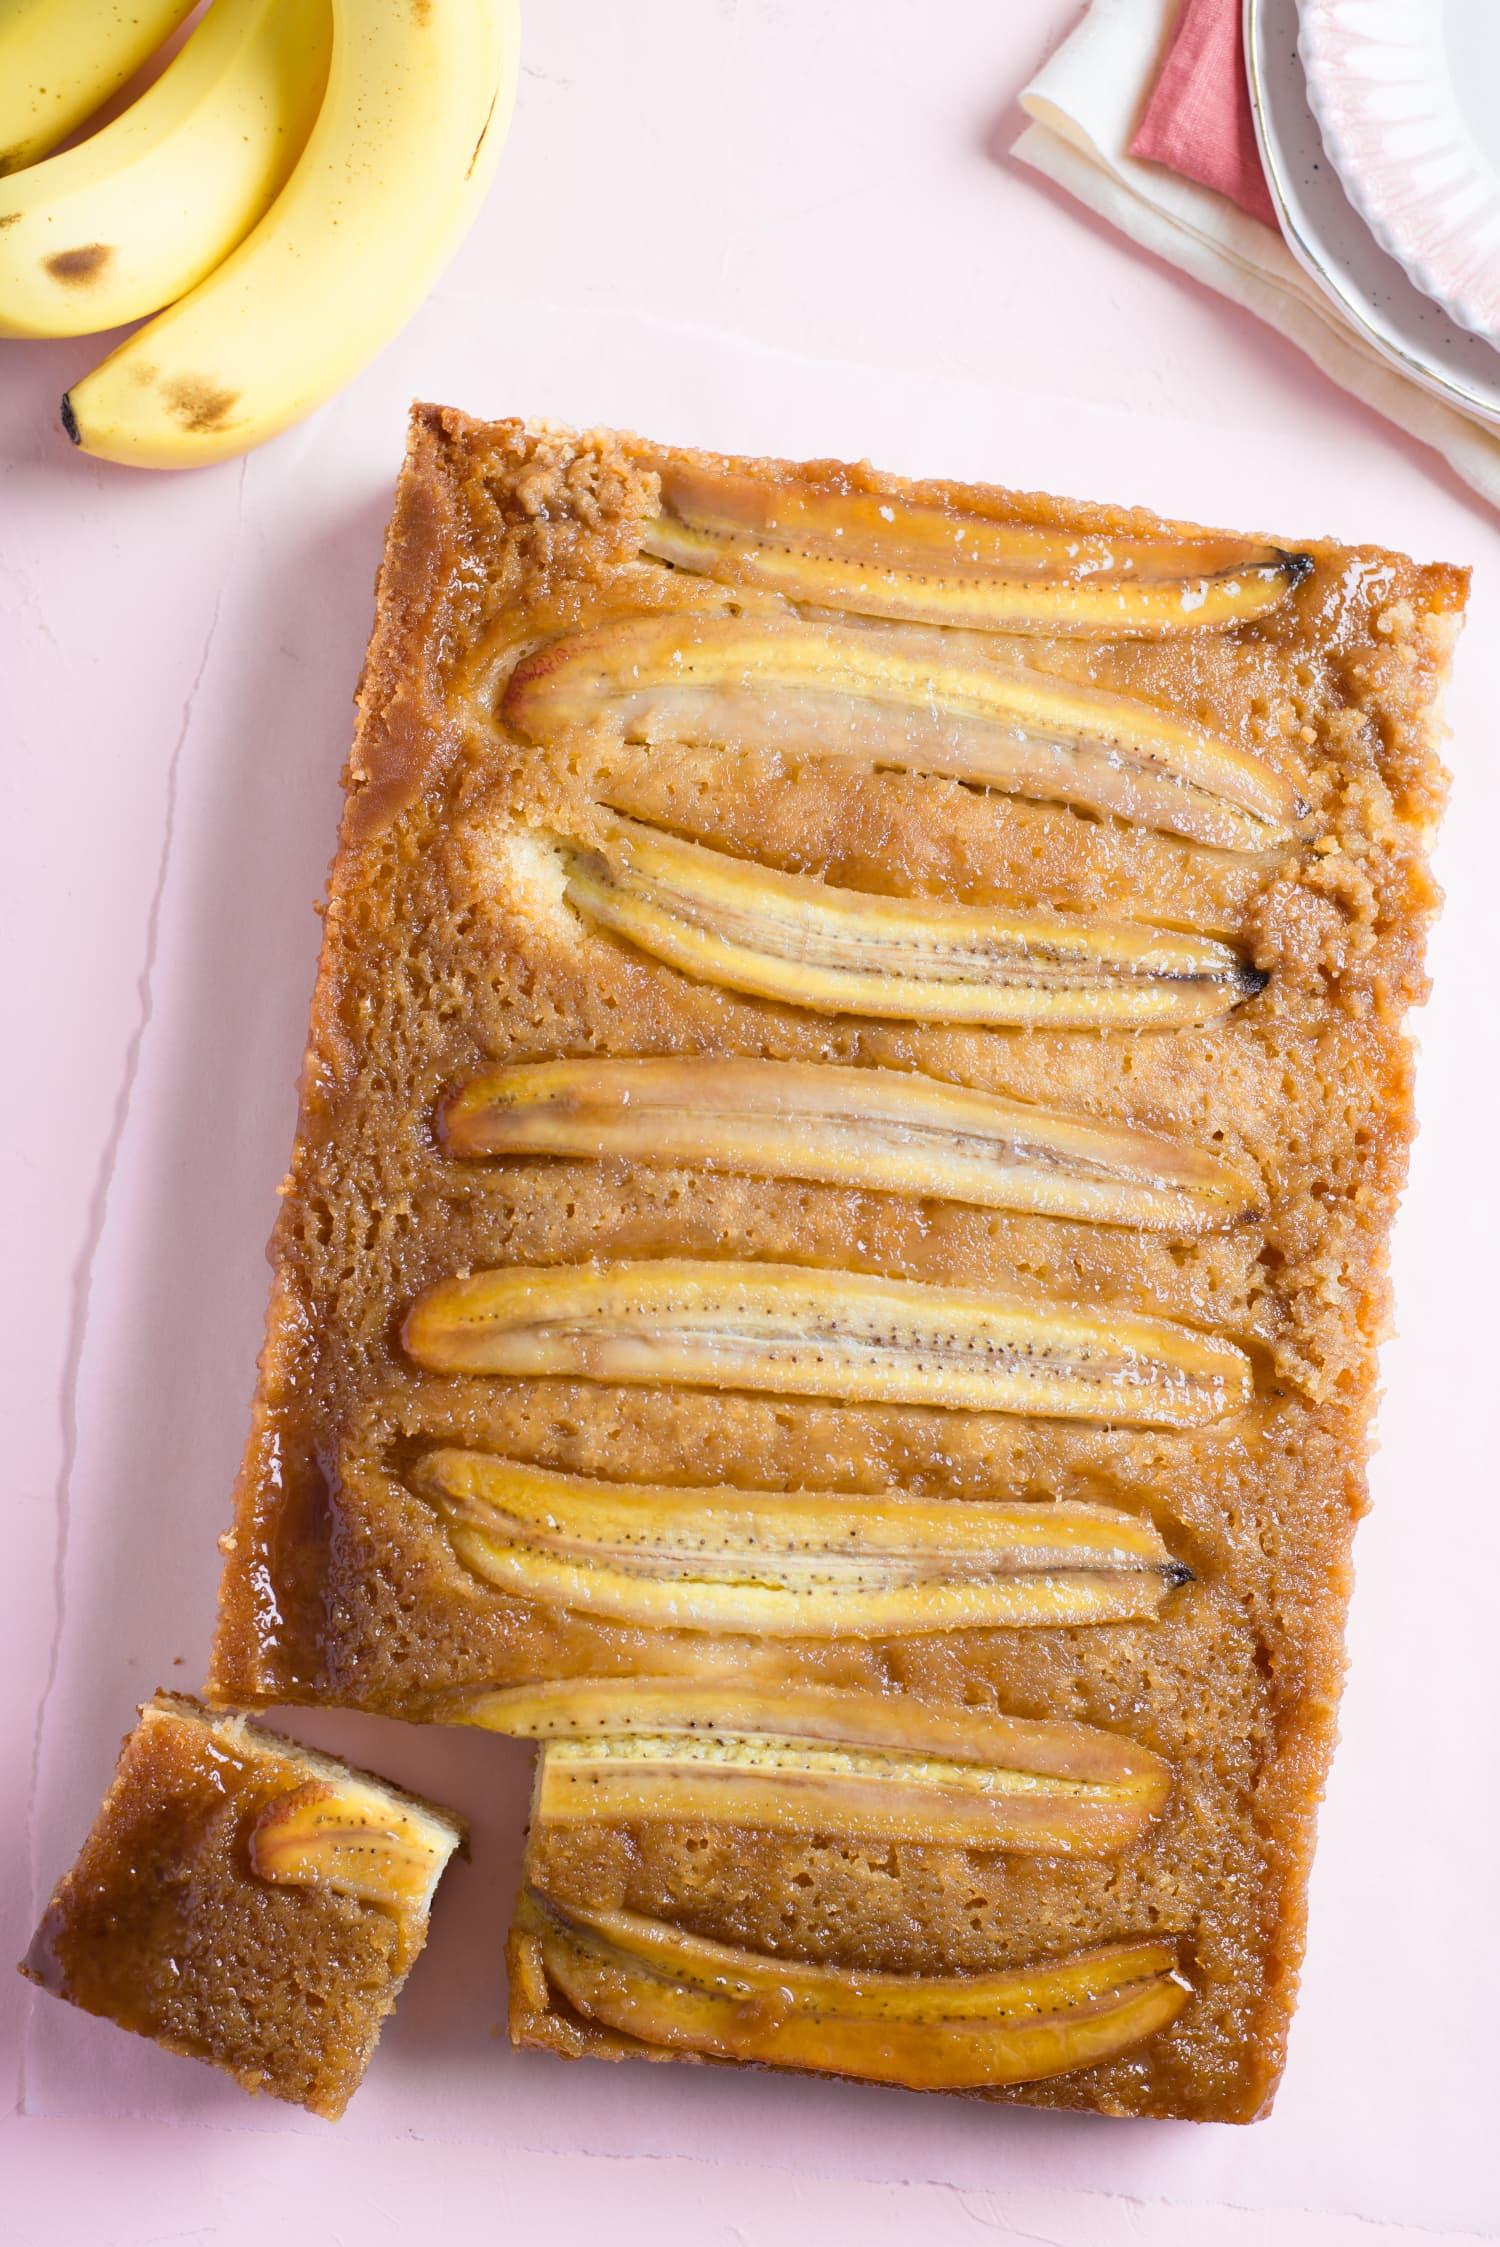 Recipe: One-Bowl Banana Upside-Down Cake